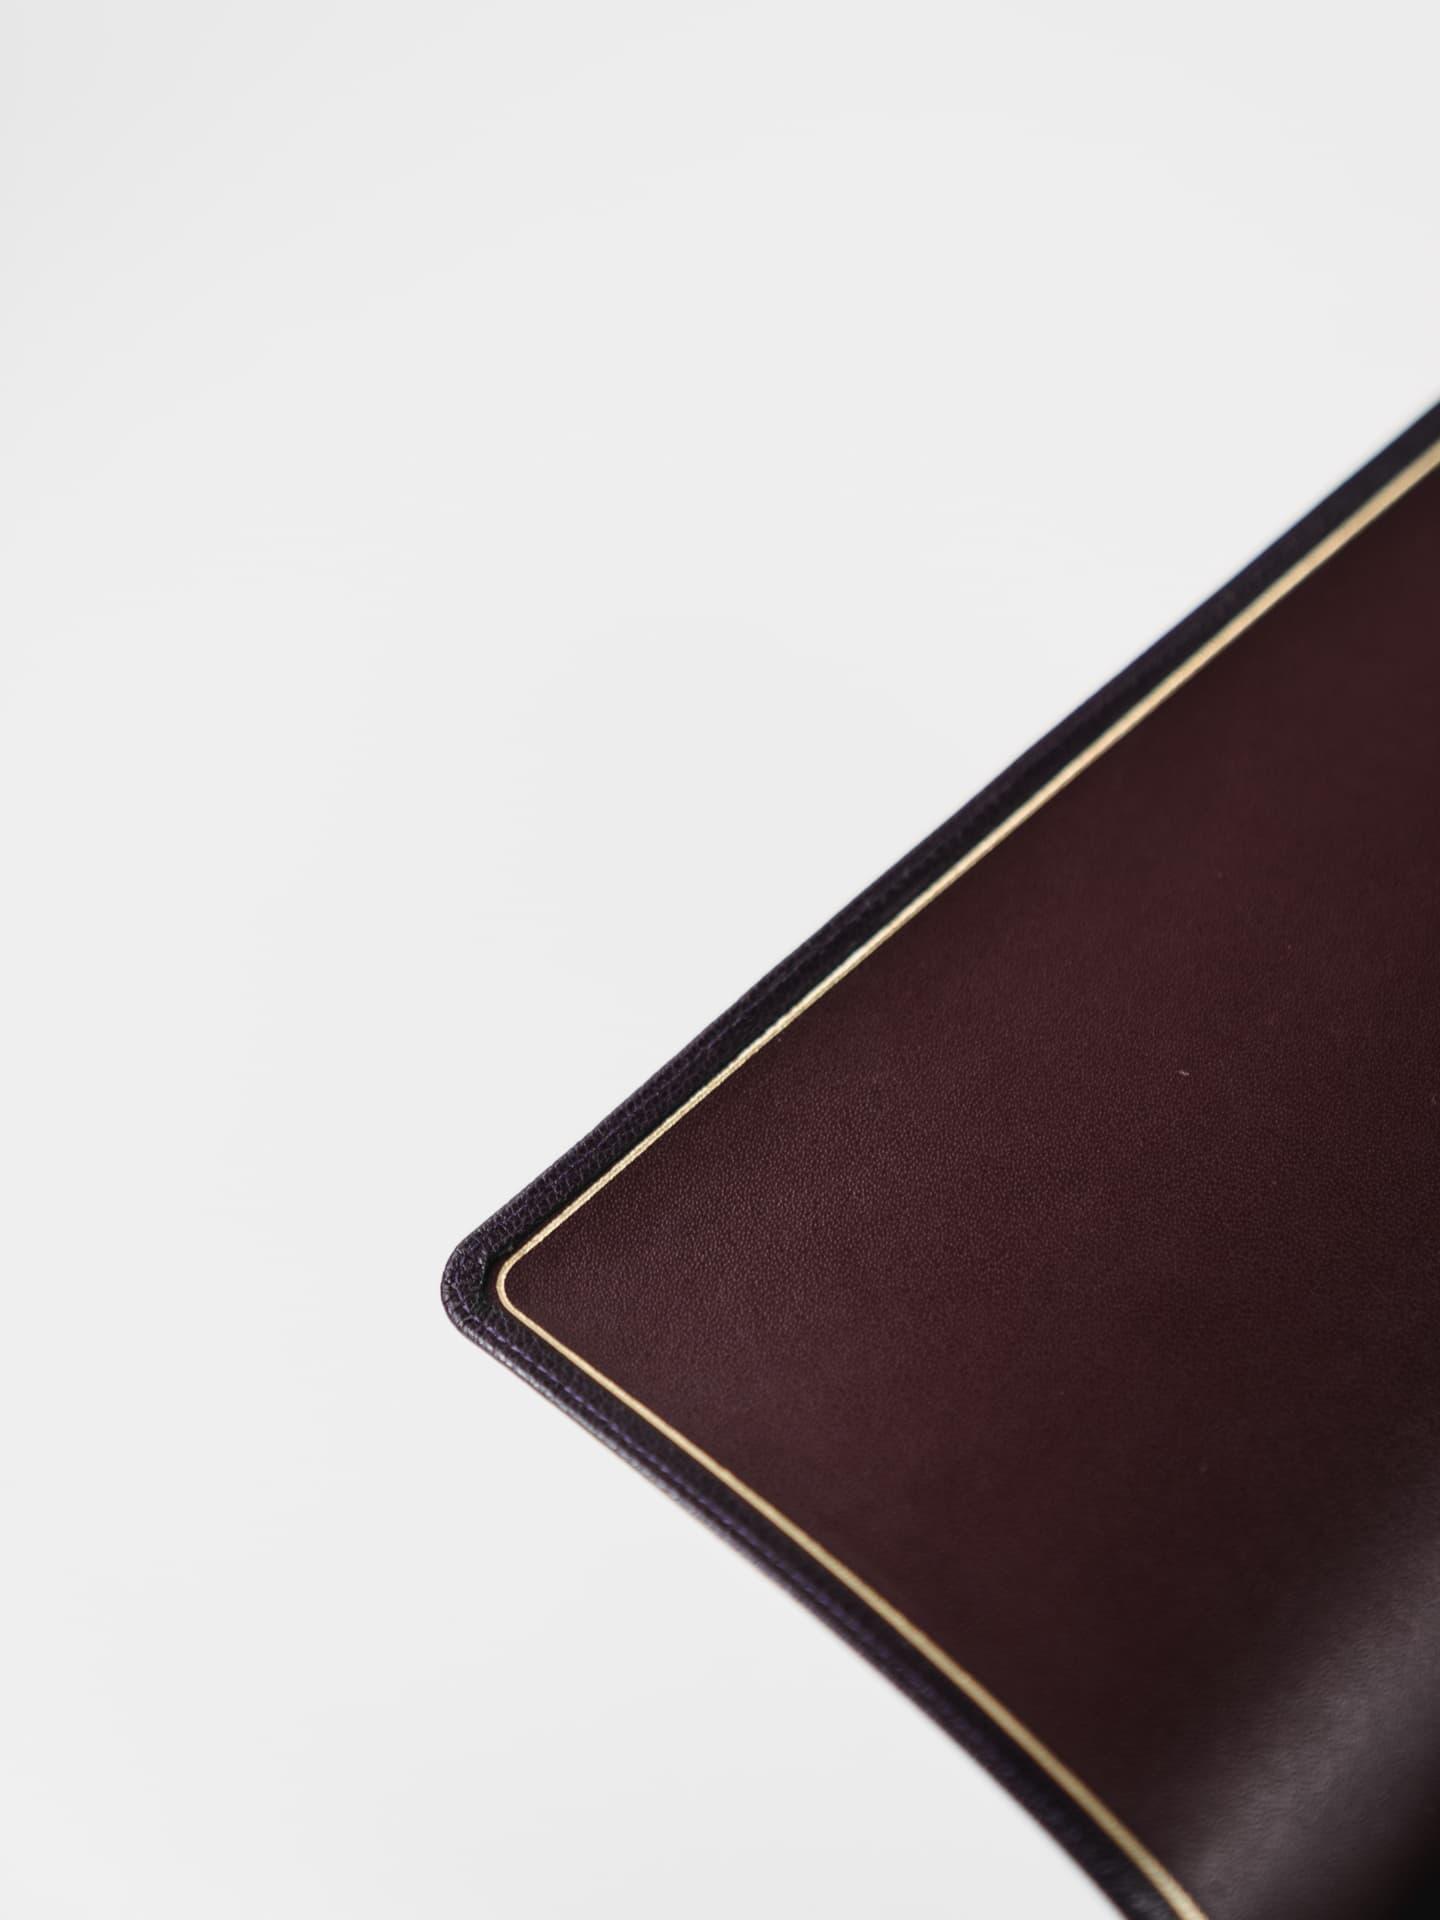 The Crossway ESV Heirloom Single Column Legacy Bible - The